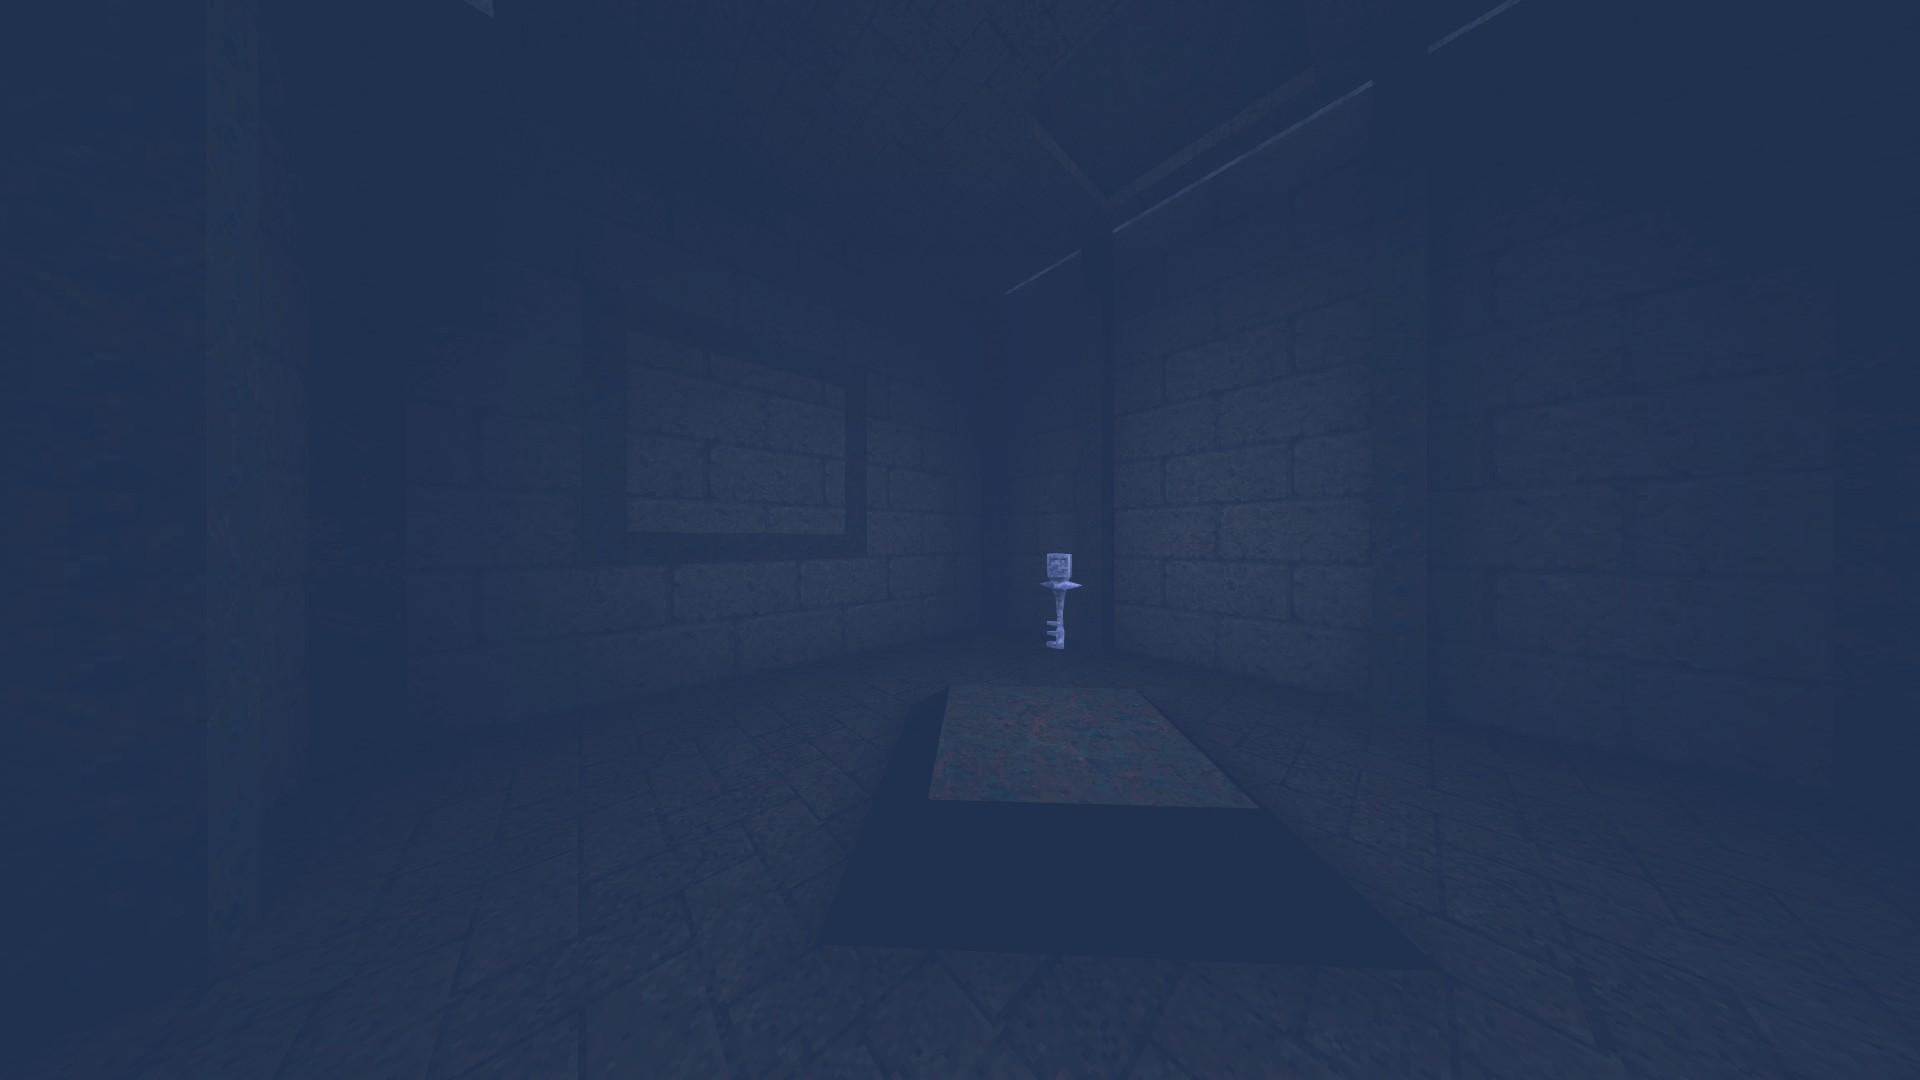 Quake - Locations of All Secrets in Game Tips - E2: Dominion of Darkness - Part I - 57A06E6